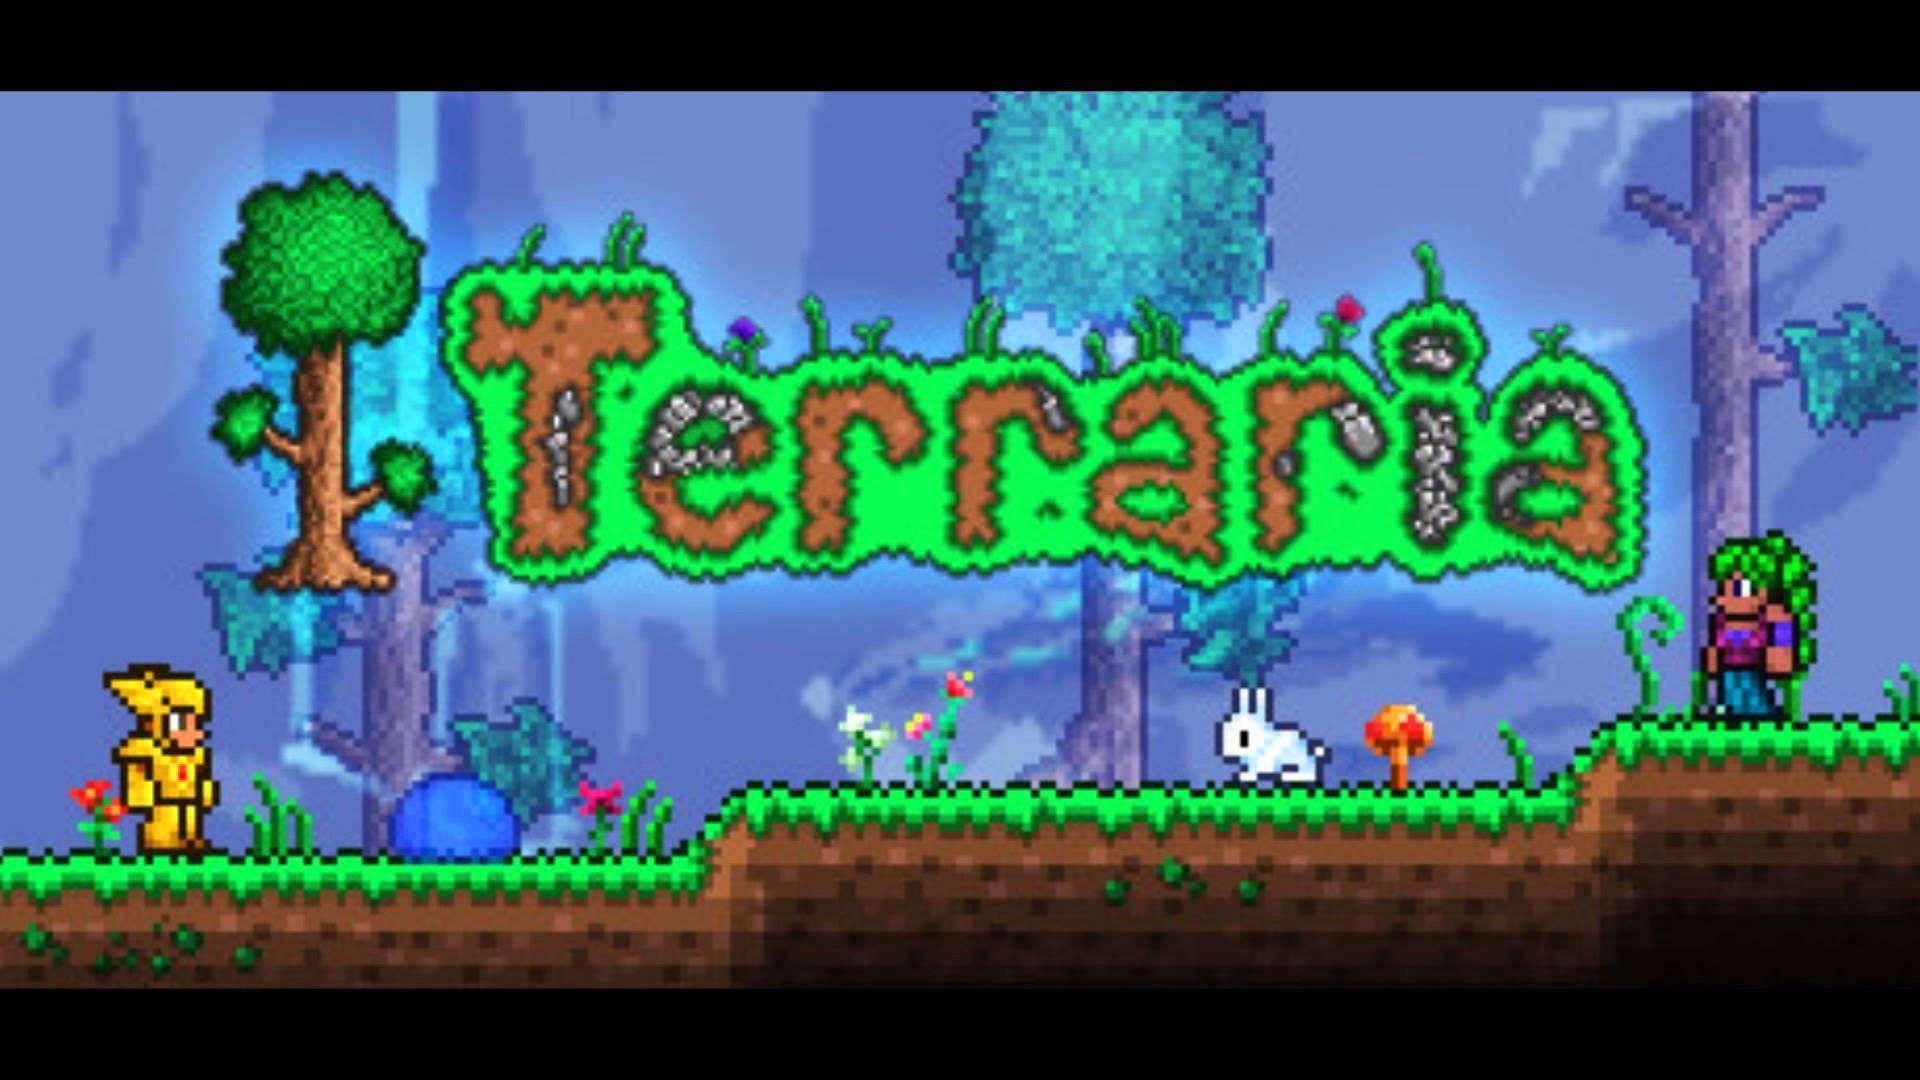 11636 - ¿Cómo de fan eres de Terraria?